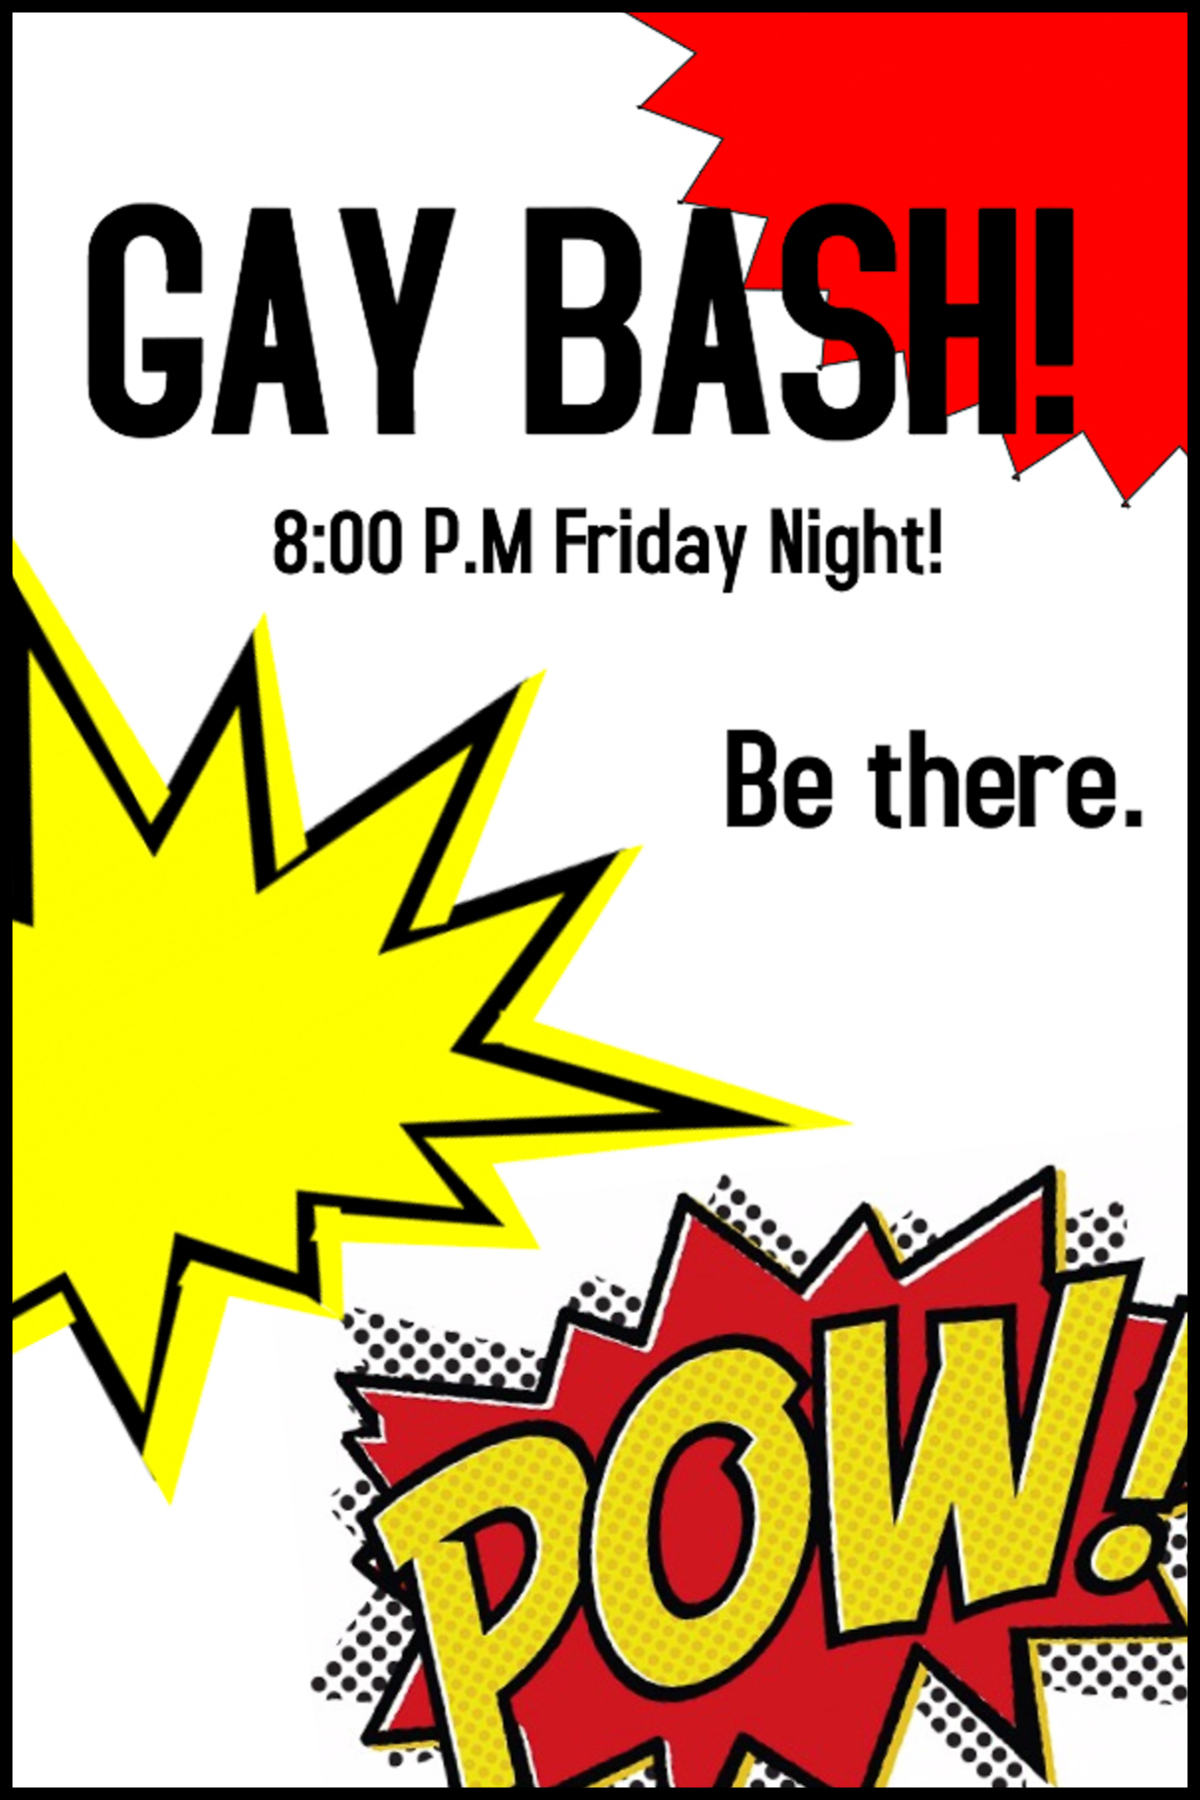 Gay Bashing And Hate Crime